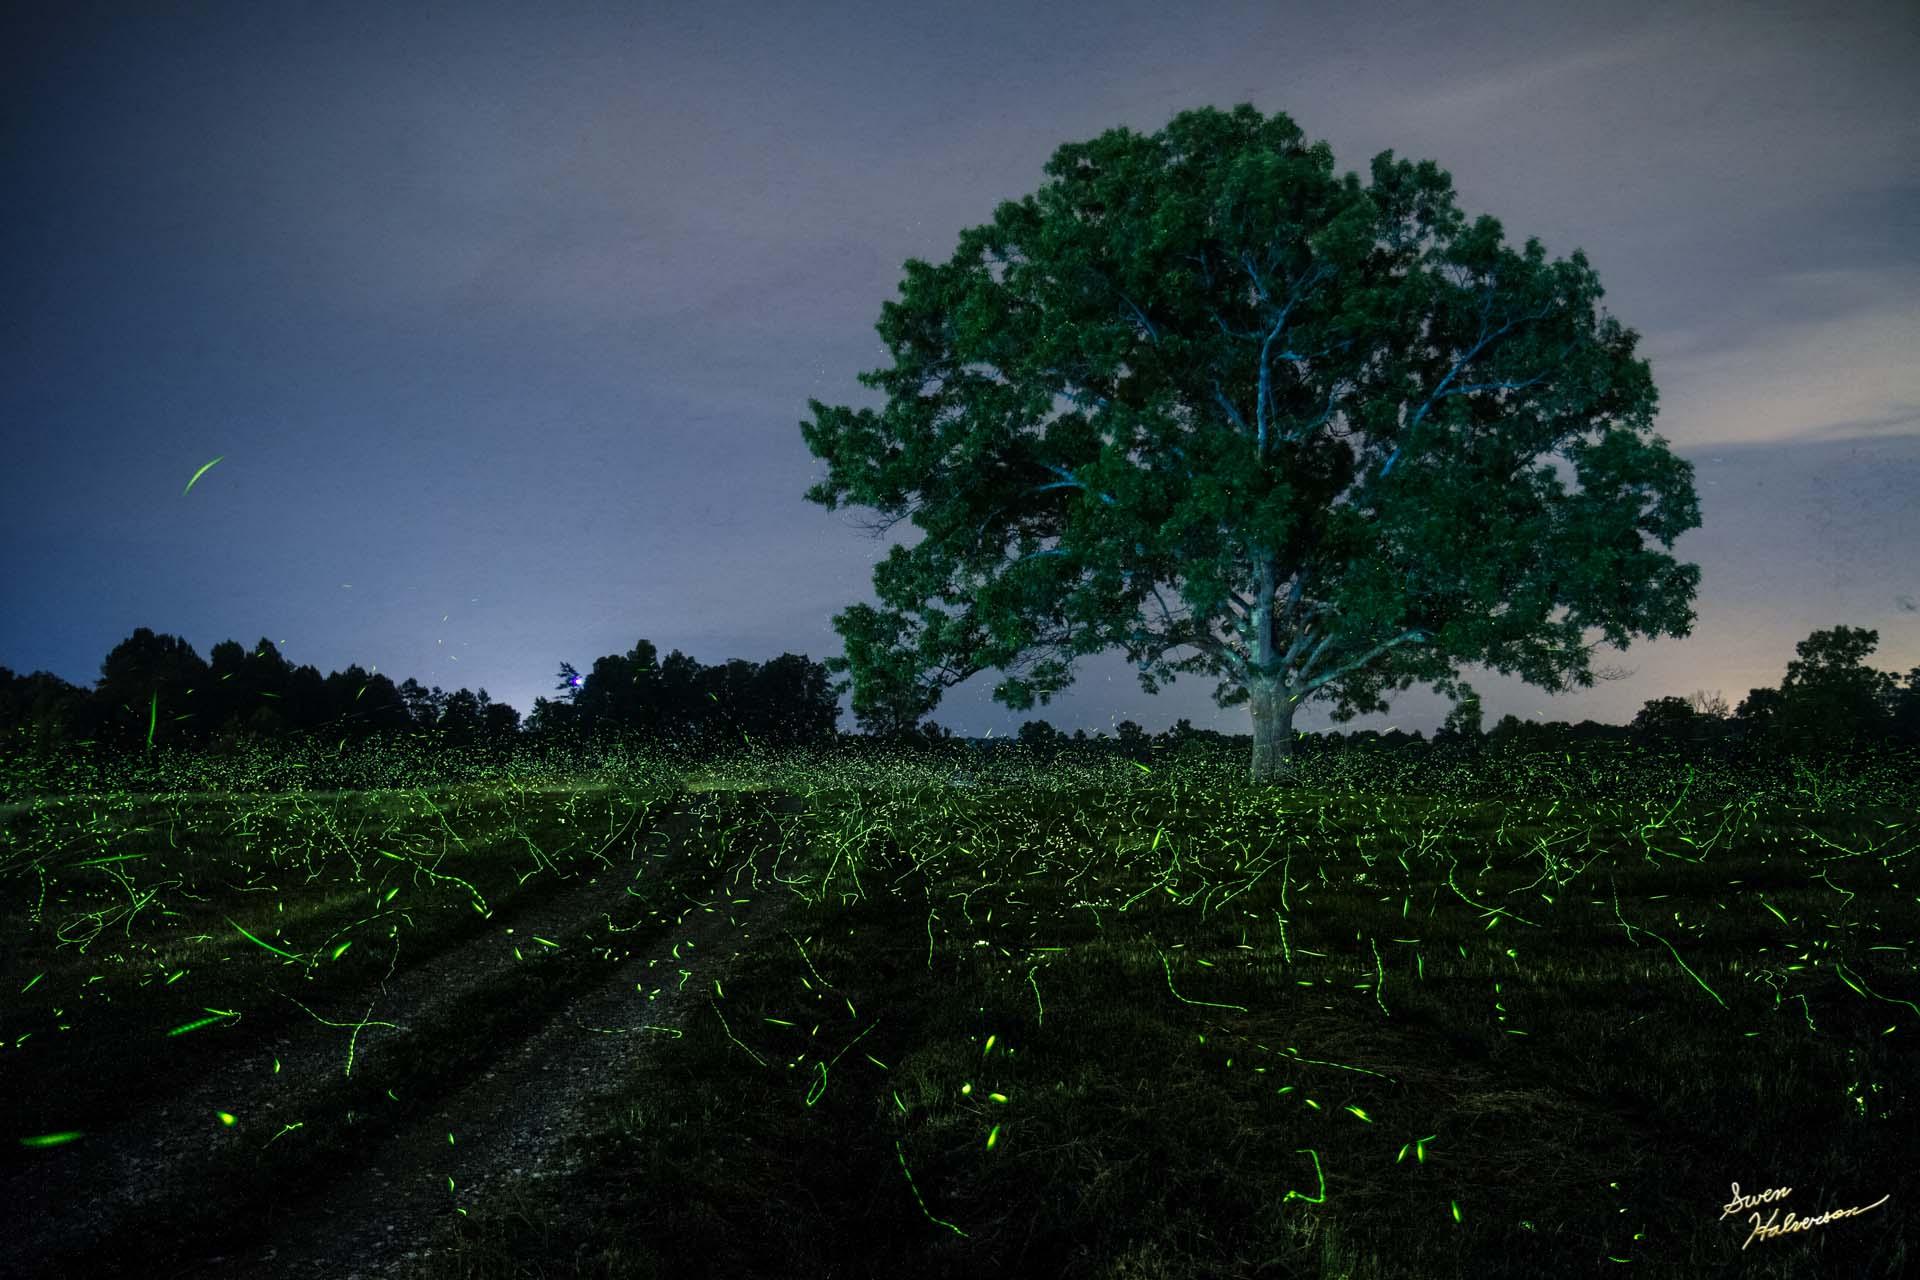 Theme: Fireflies | Title: Fireflies At The Oak Tree